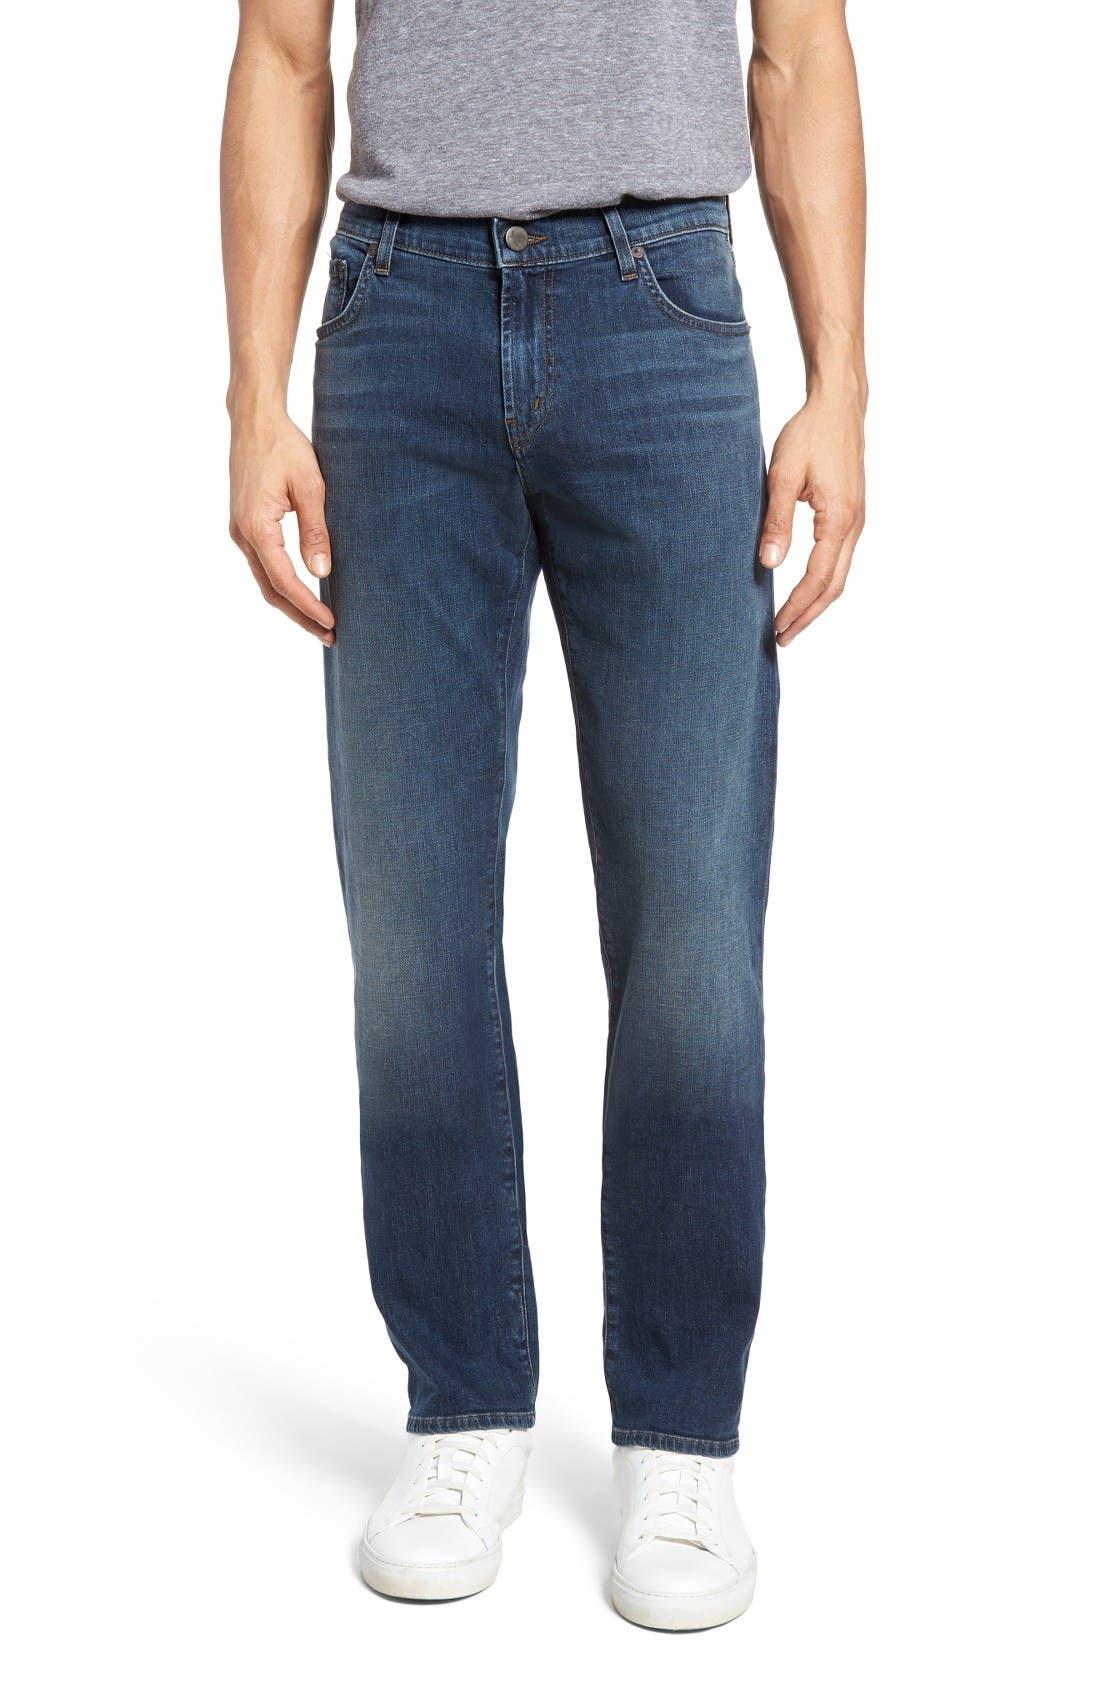 Alternate Image 1 Selected - J Brand Kane Slim Straight Leg Jeans (Helium)